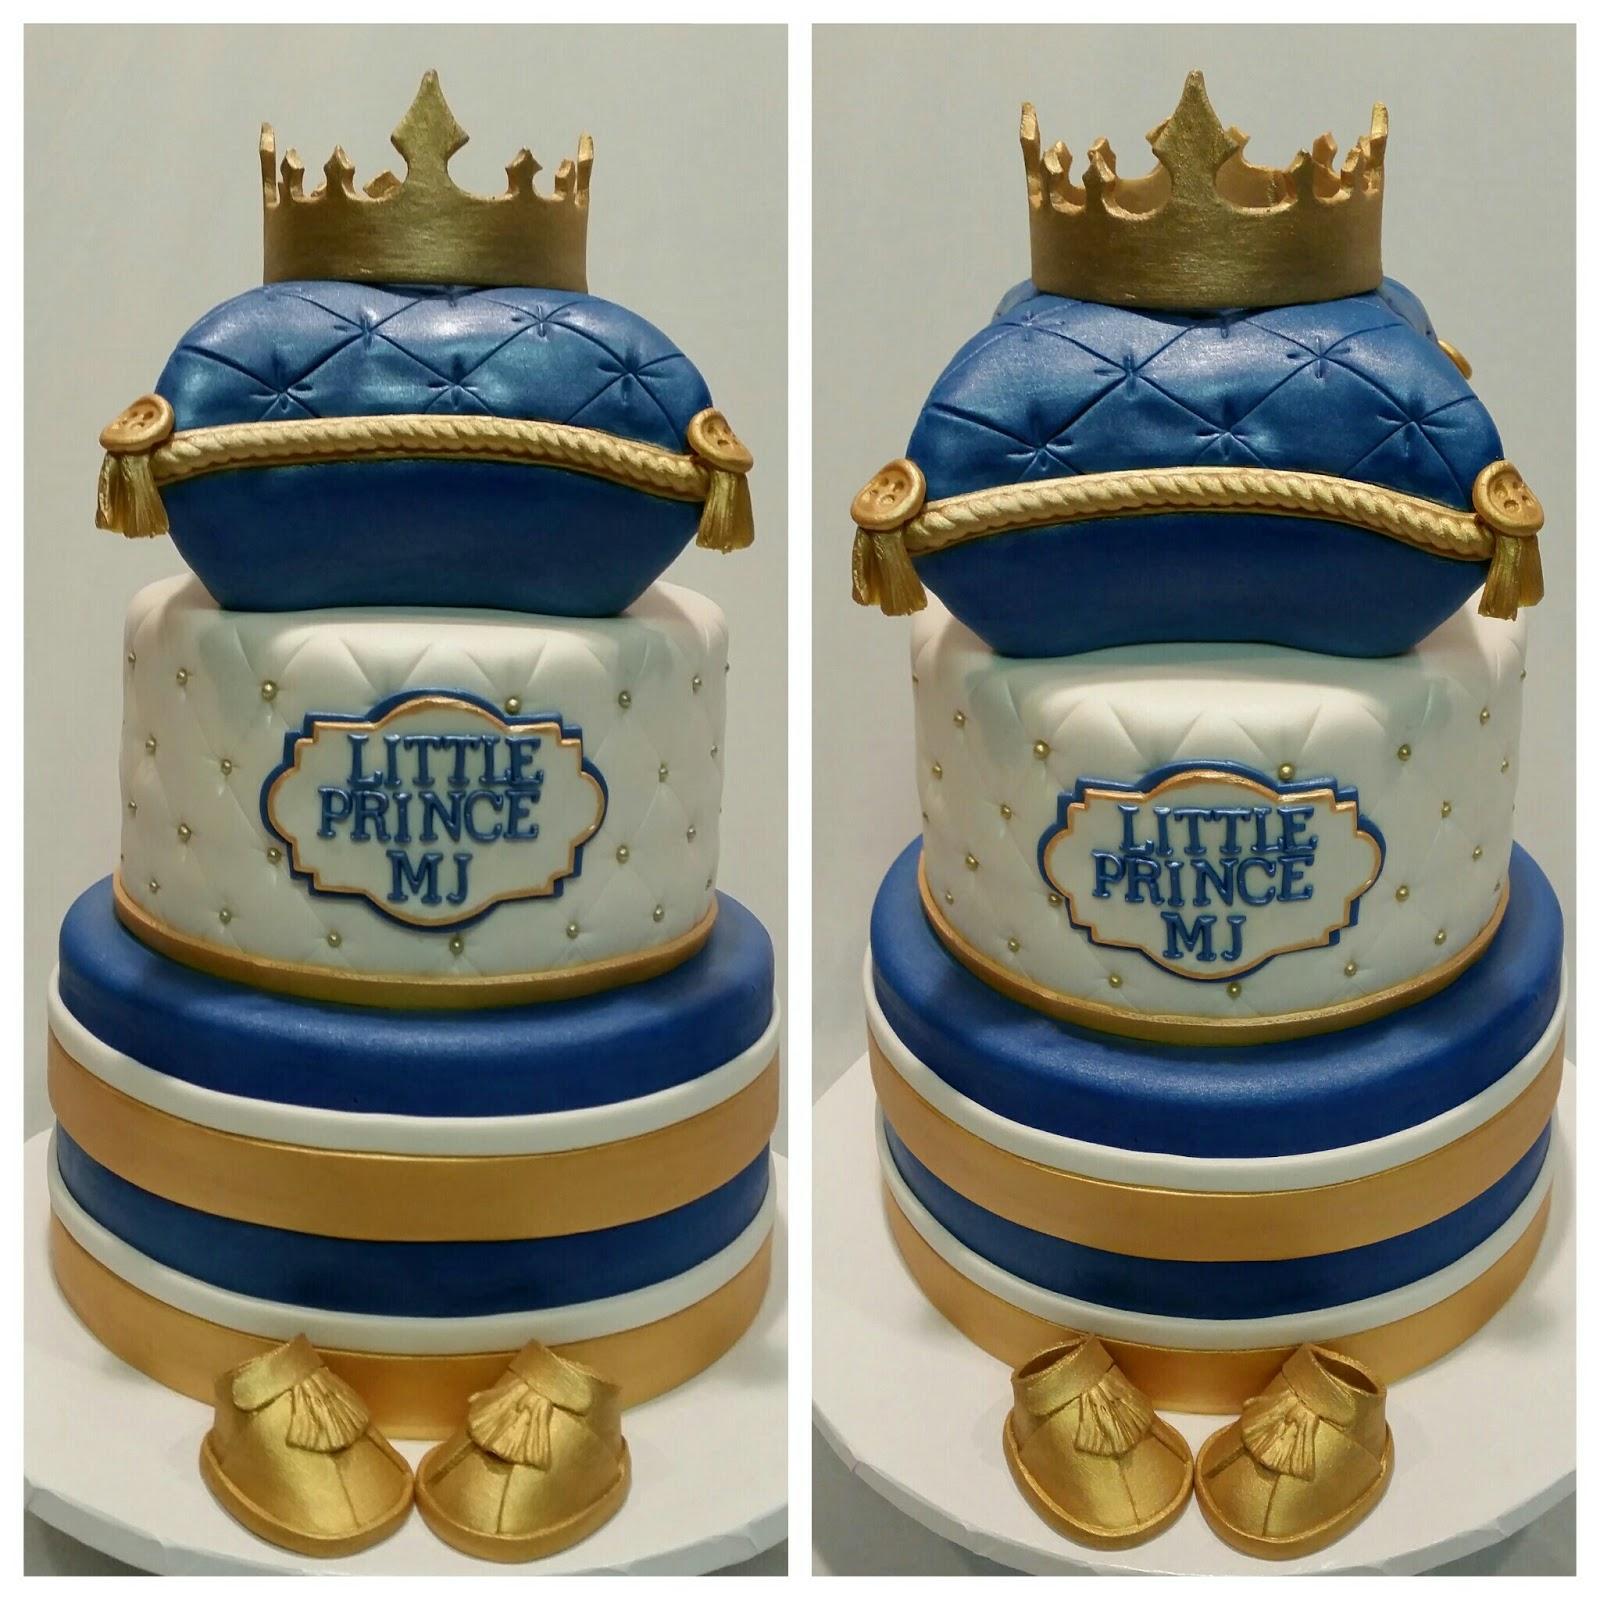 MyMoniCakes: Royal Baby Cake Ideas With Handmade Crowns